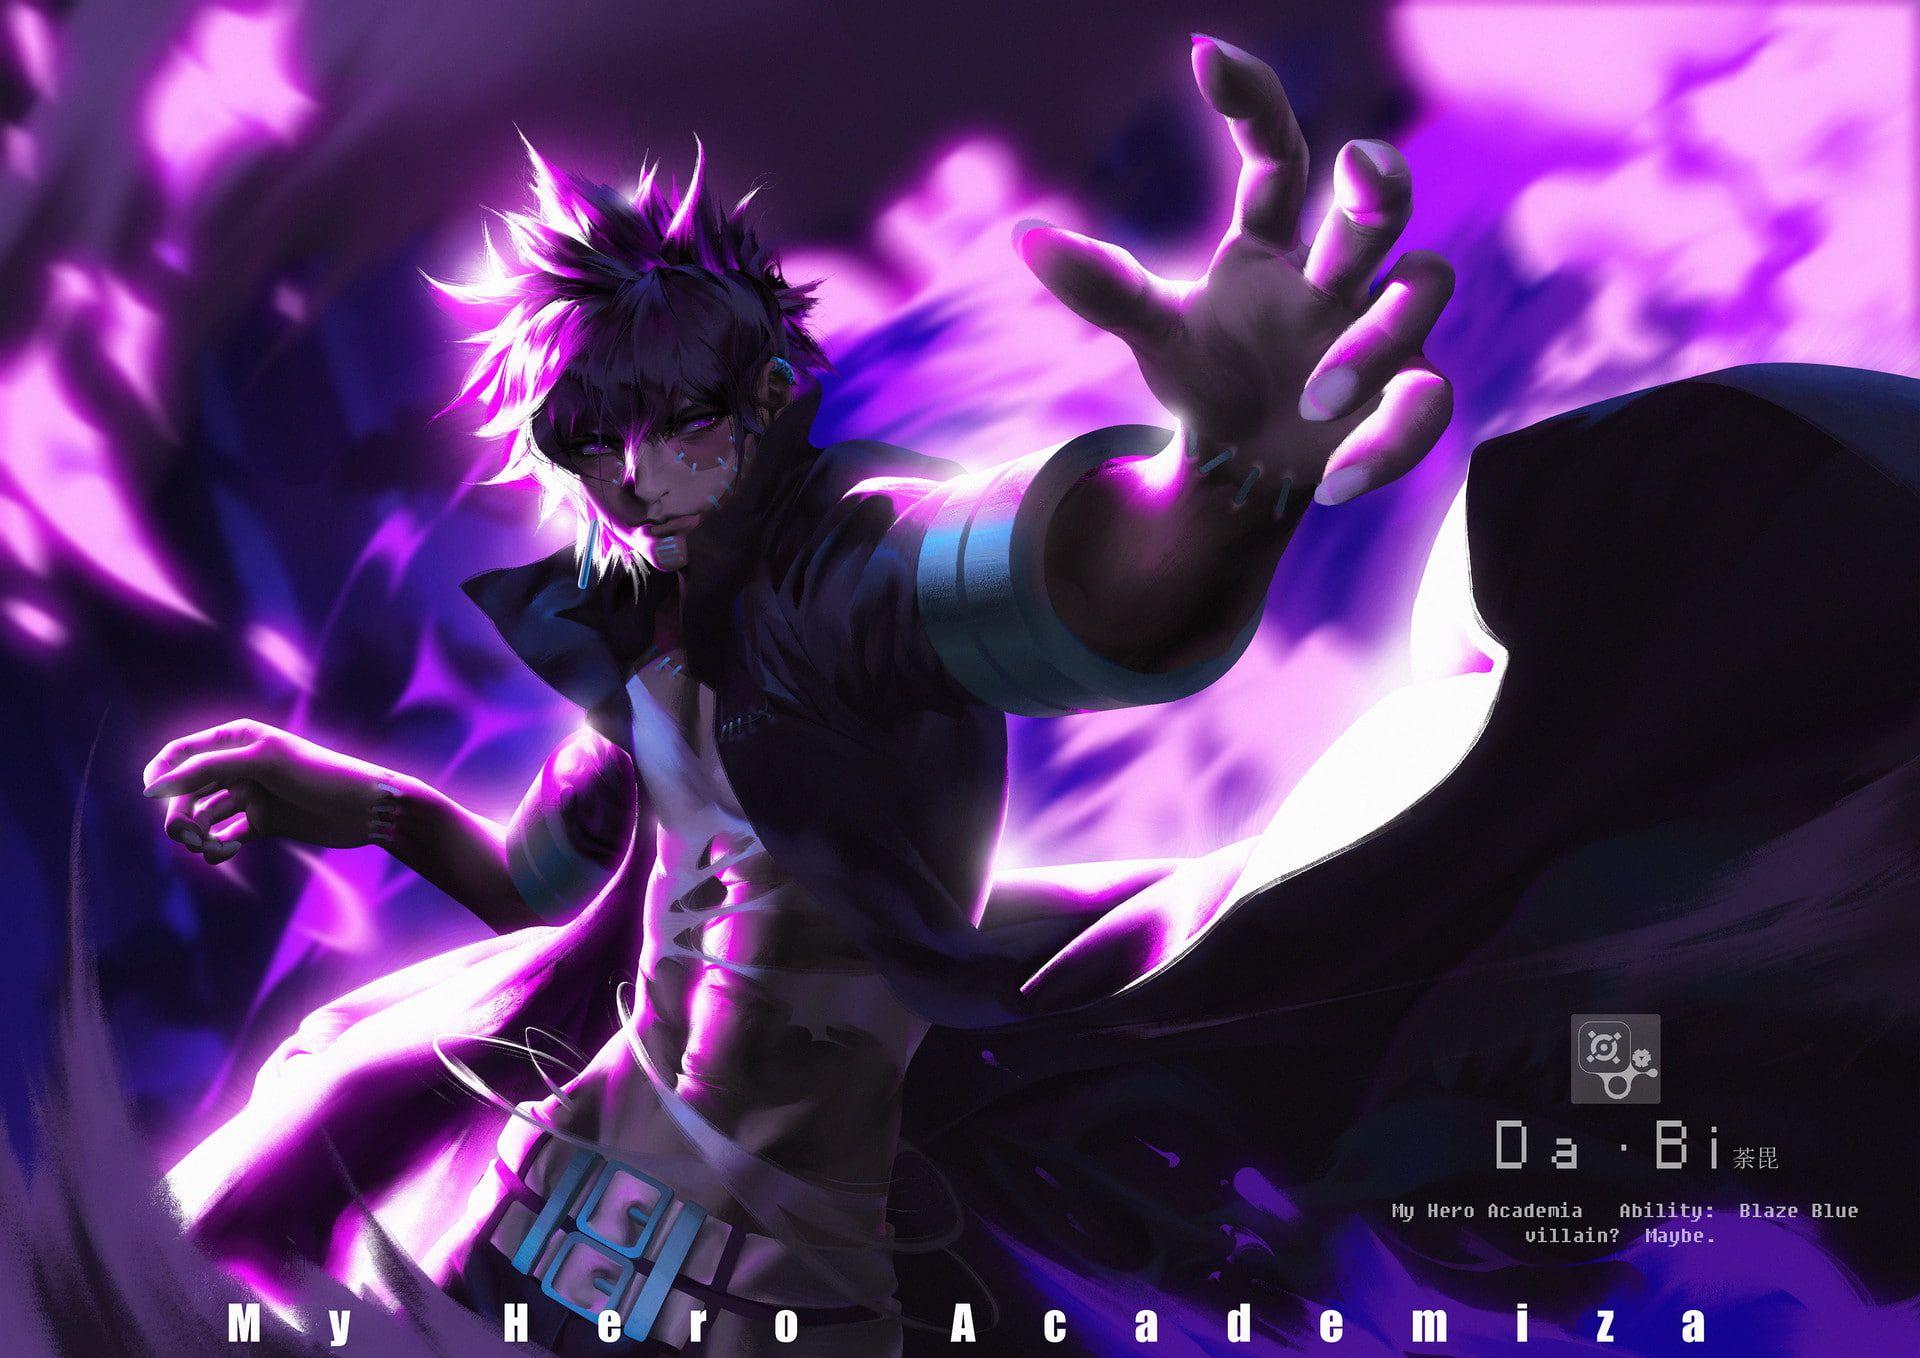 Anime My Hero Academia Dabi Boku No Hero Academia 1080p Wallpaper Hdwallpaper Desktop Boku No Hero Academia My Hero Academia Anime